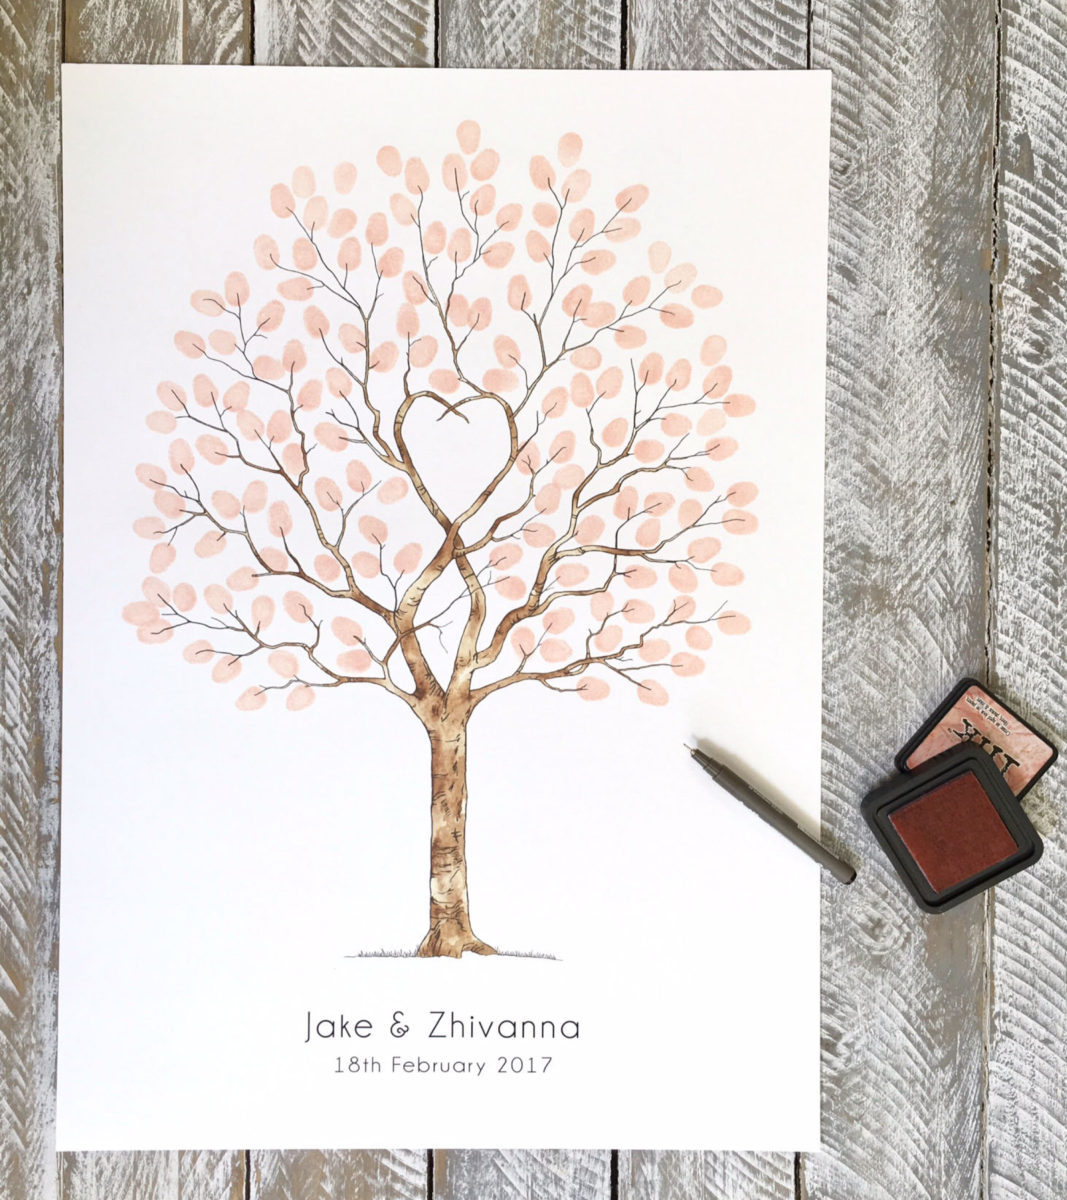 Guest Book Alternative Thumbprint Wedding Tree Fingerprint: Fingerprint Guest Book Tree